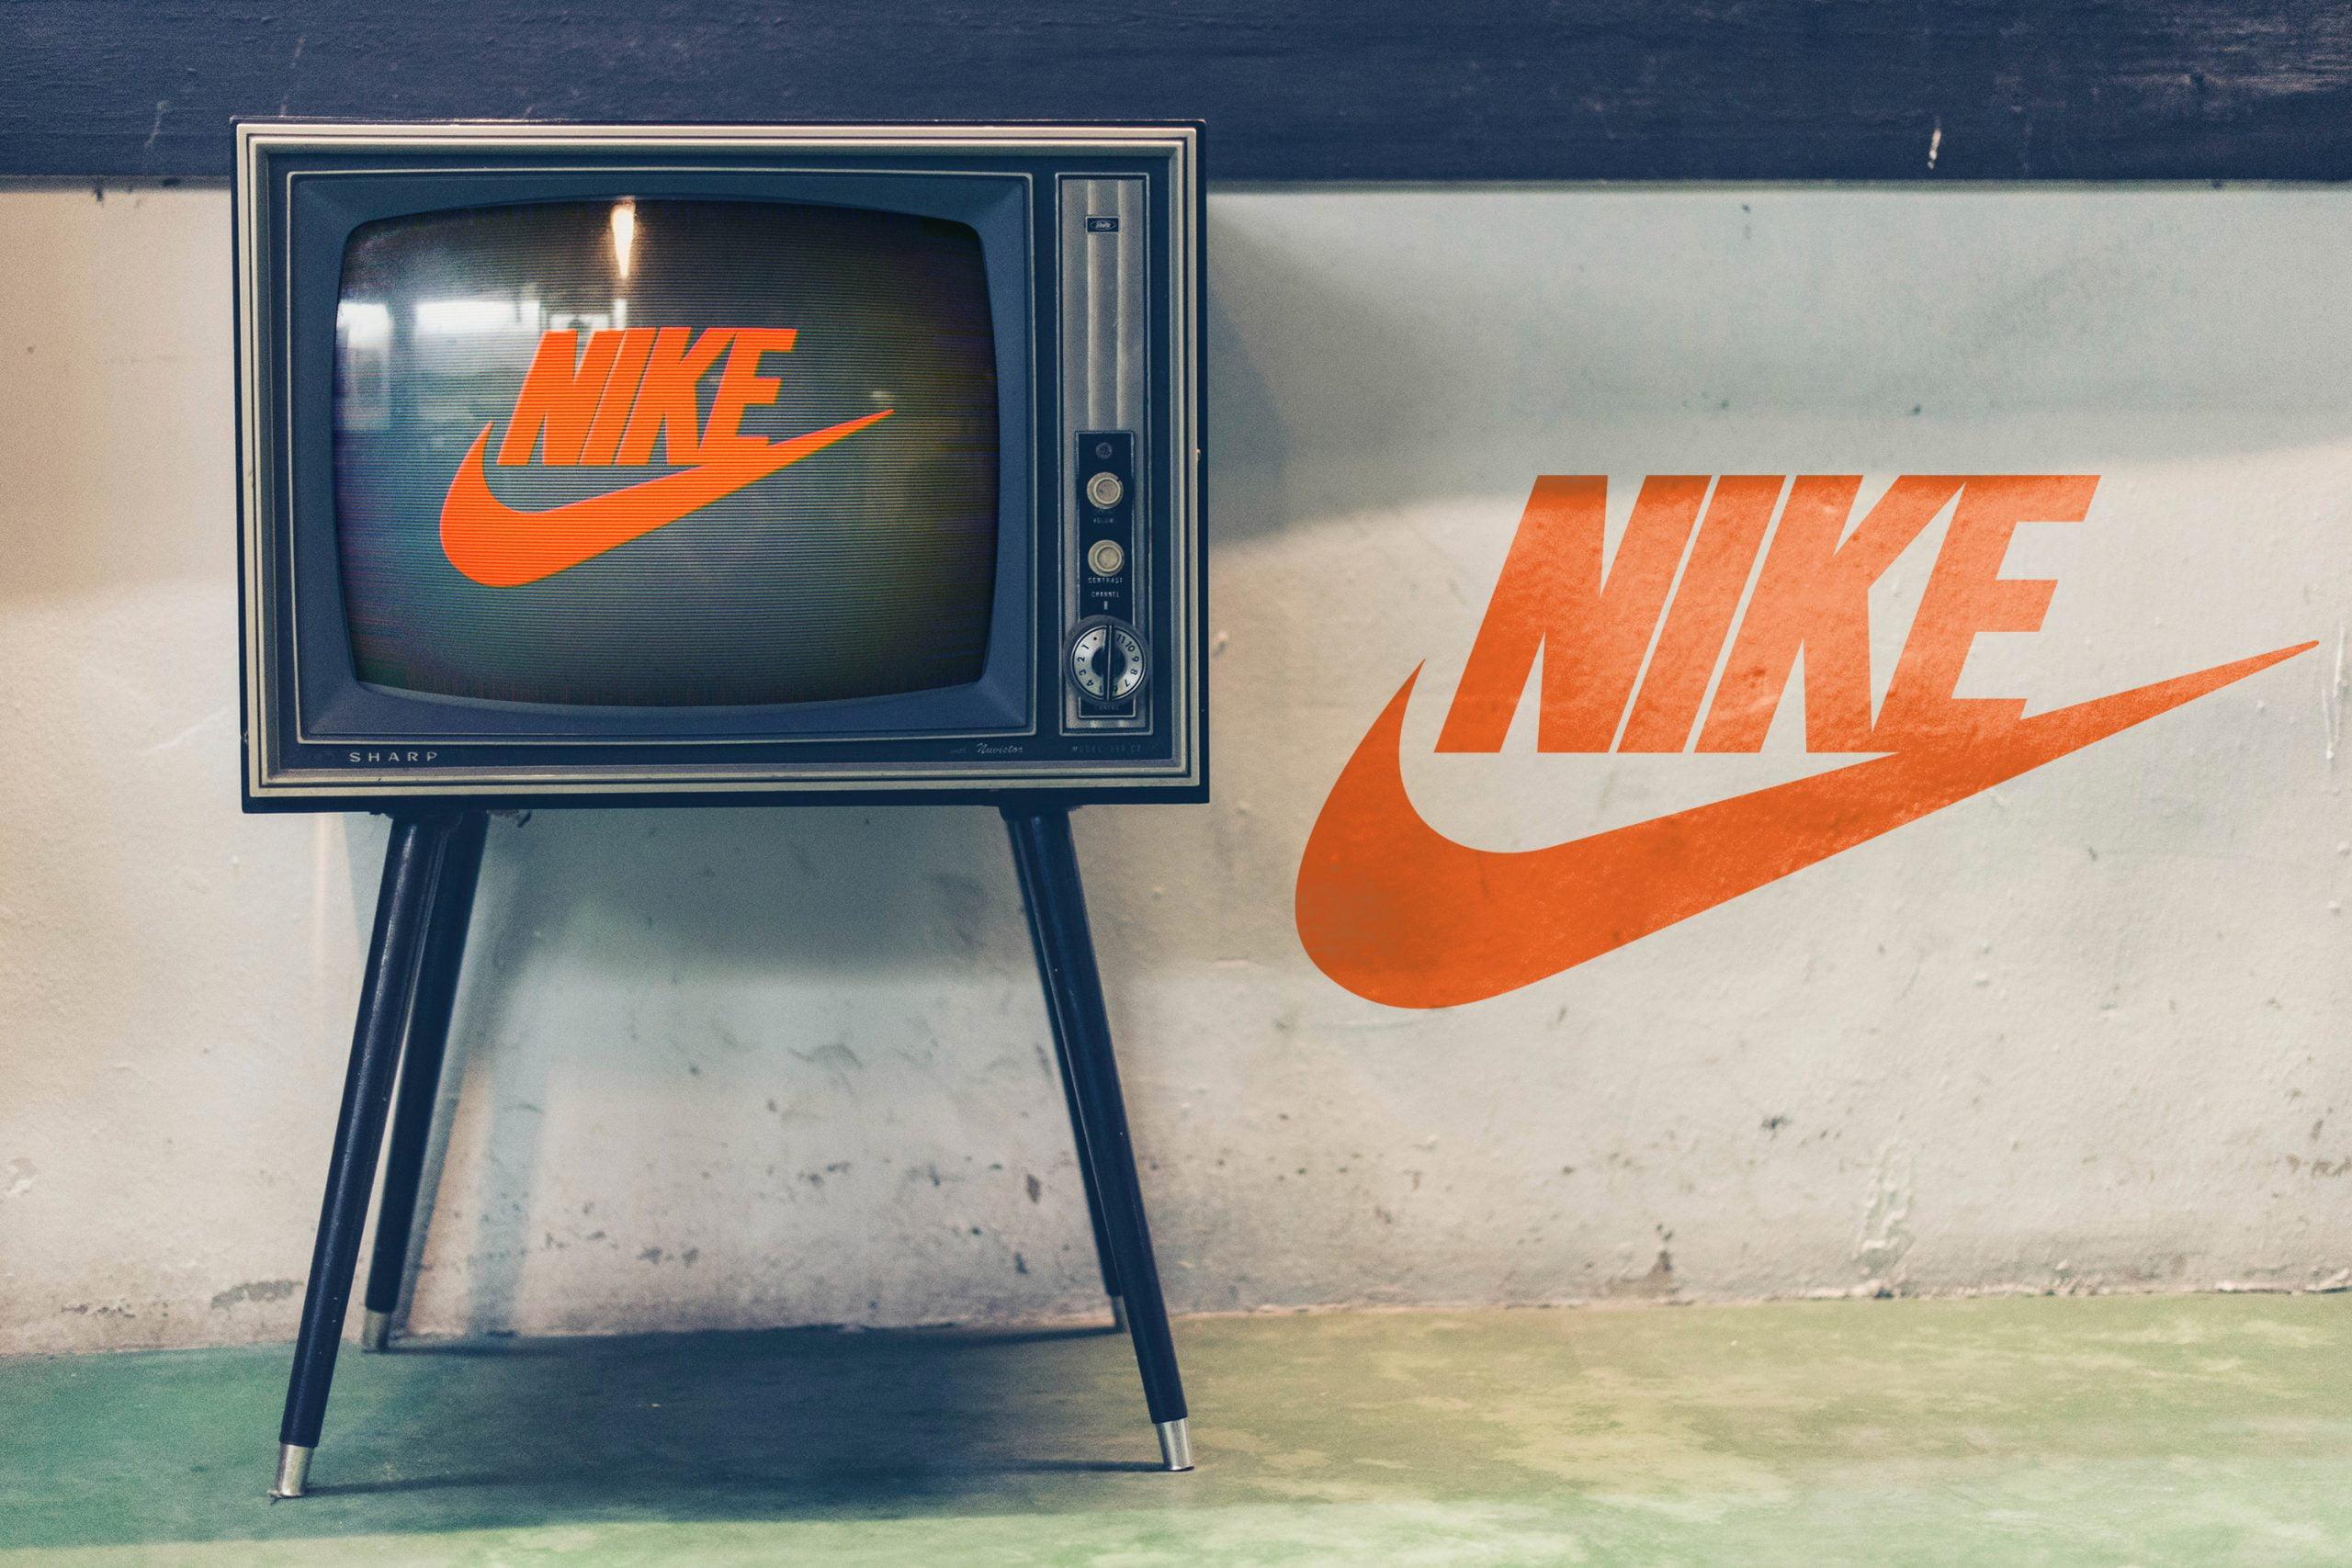 Free Download Old TV Glitch Logo Mockup